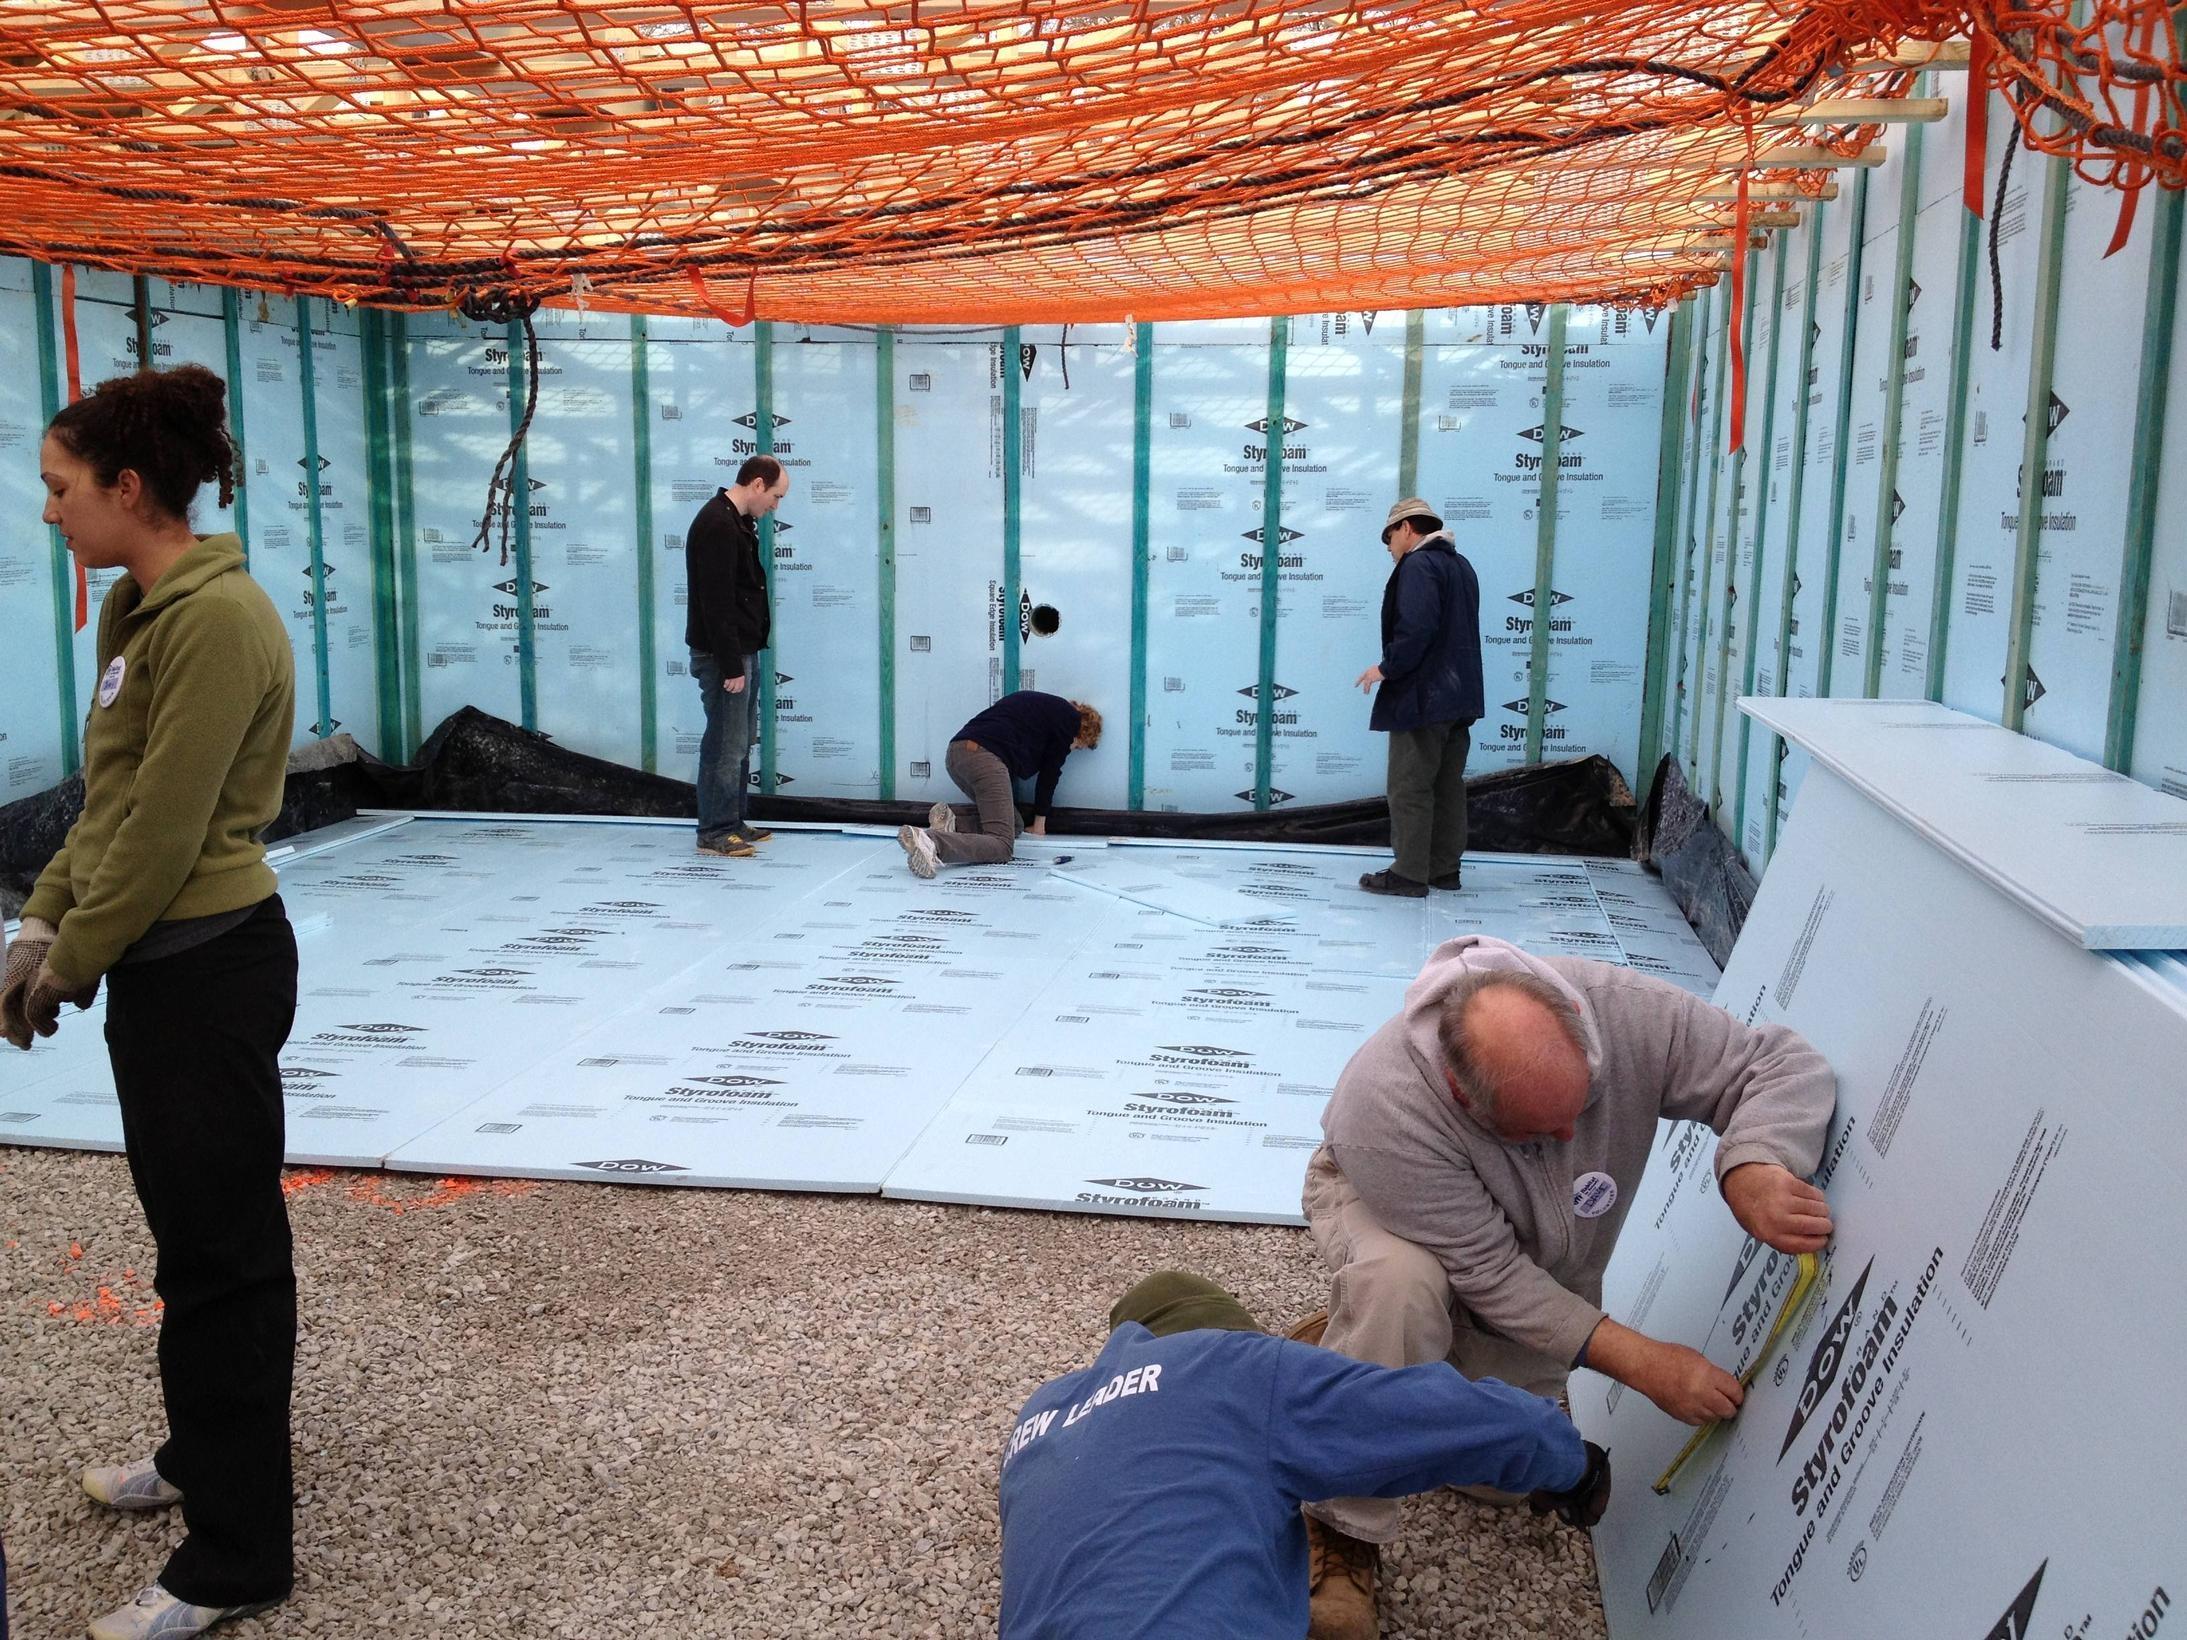 Insulating A Basement Wall With Rigid Foam